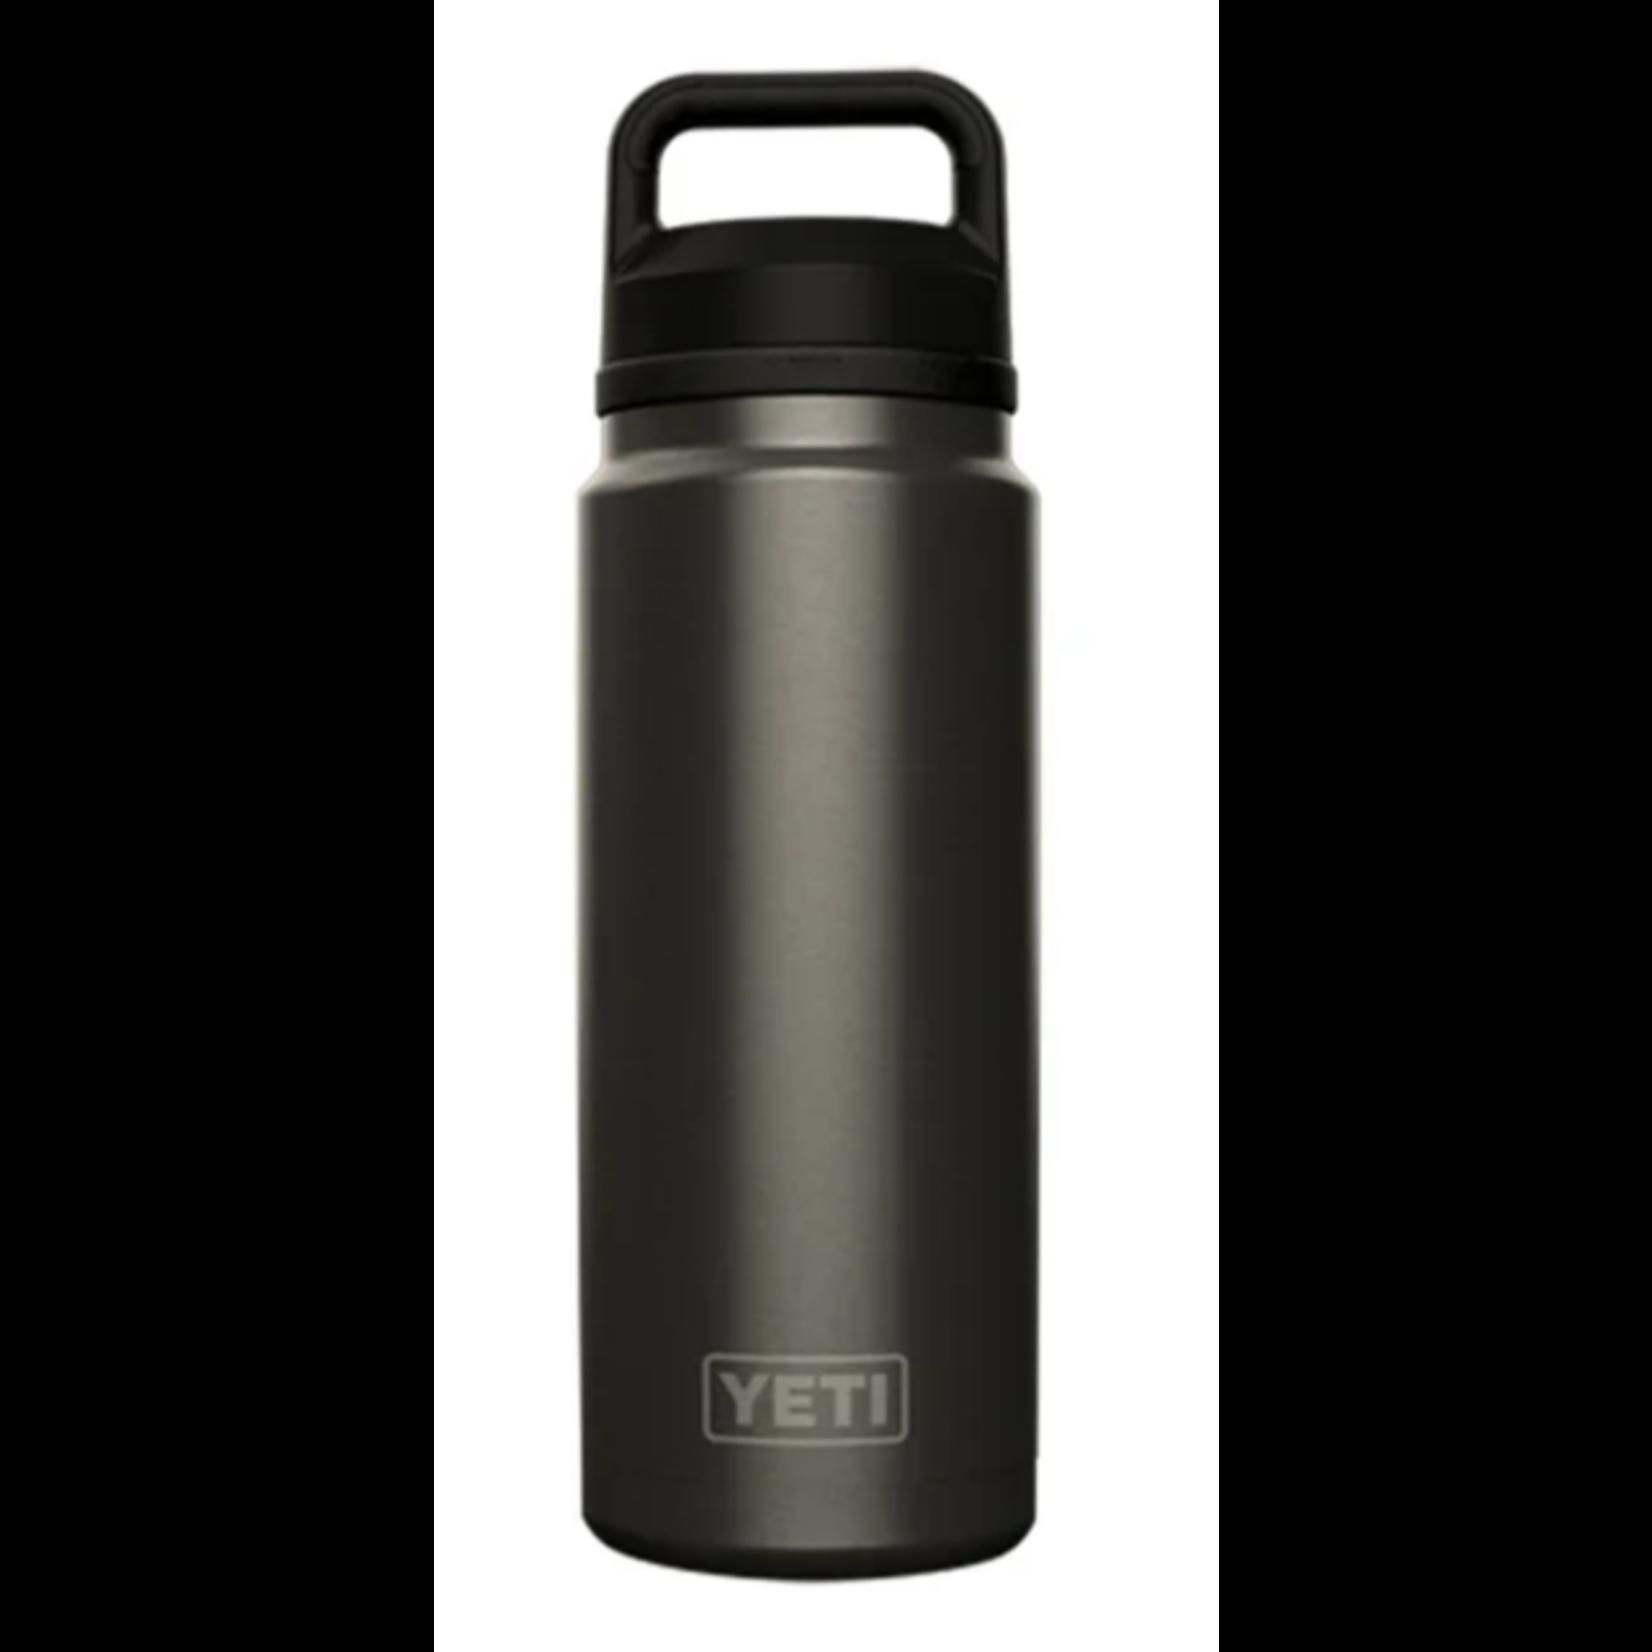 YETI ELEMENTS Rambler 36oz Bottle w/ Chug Cap